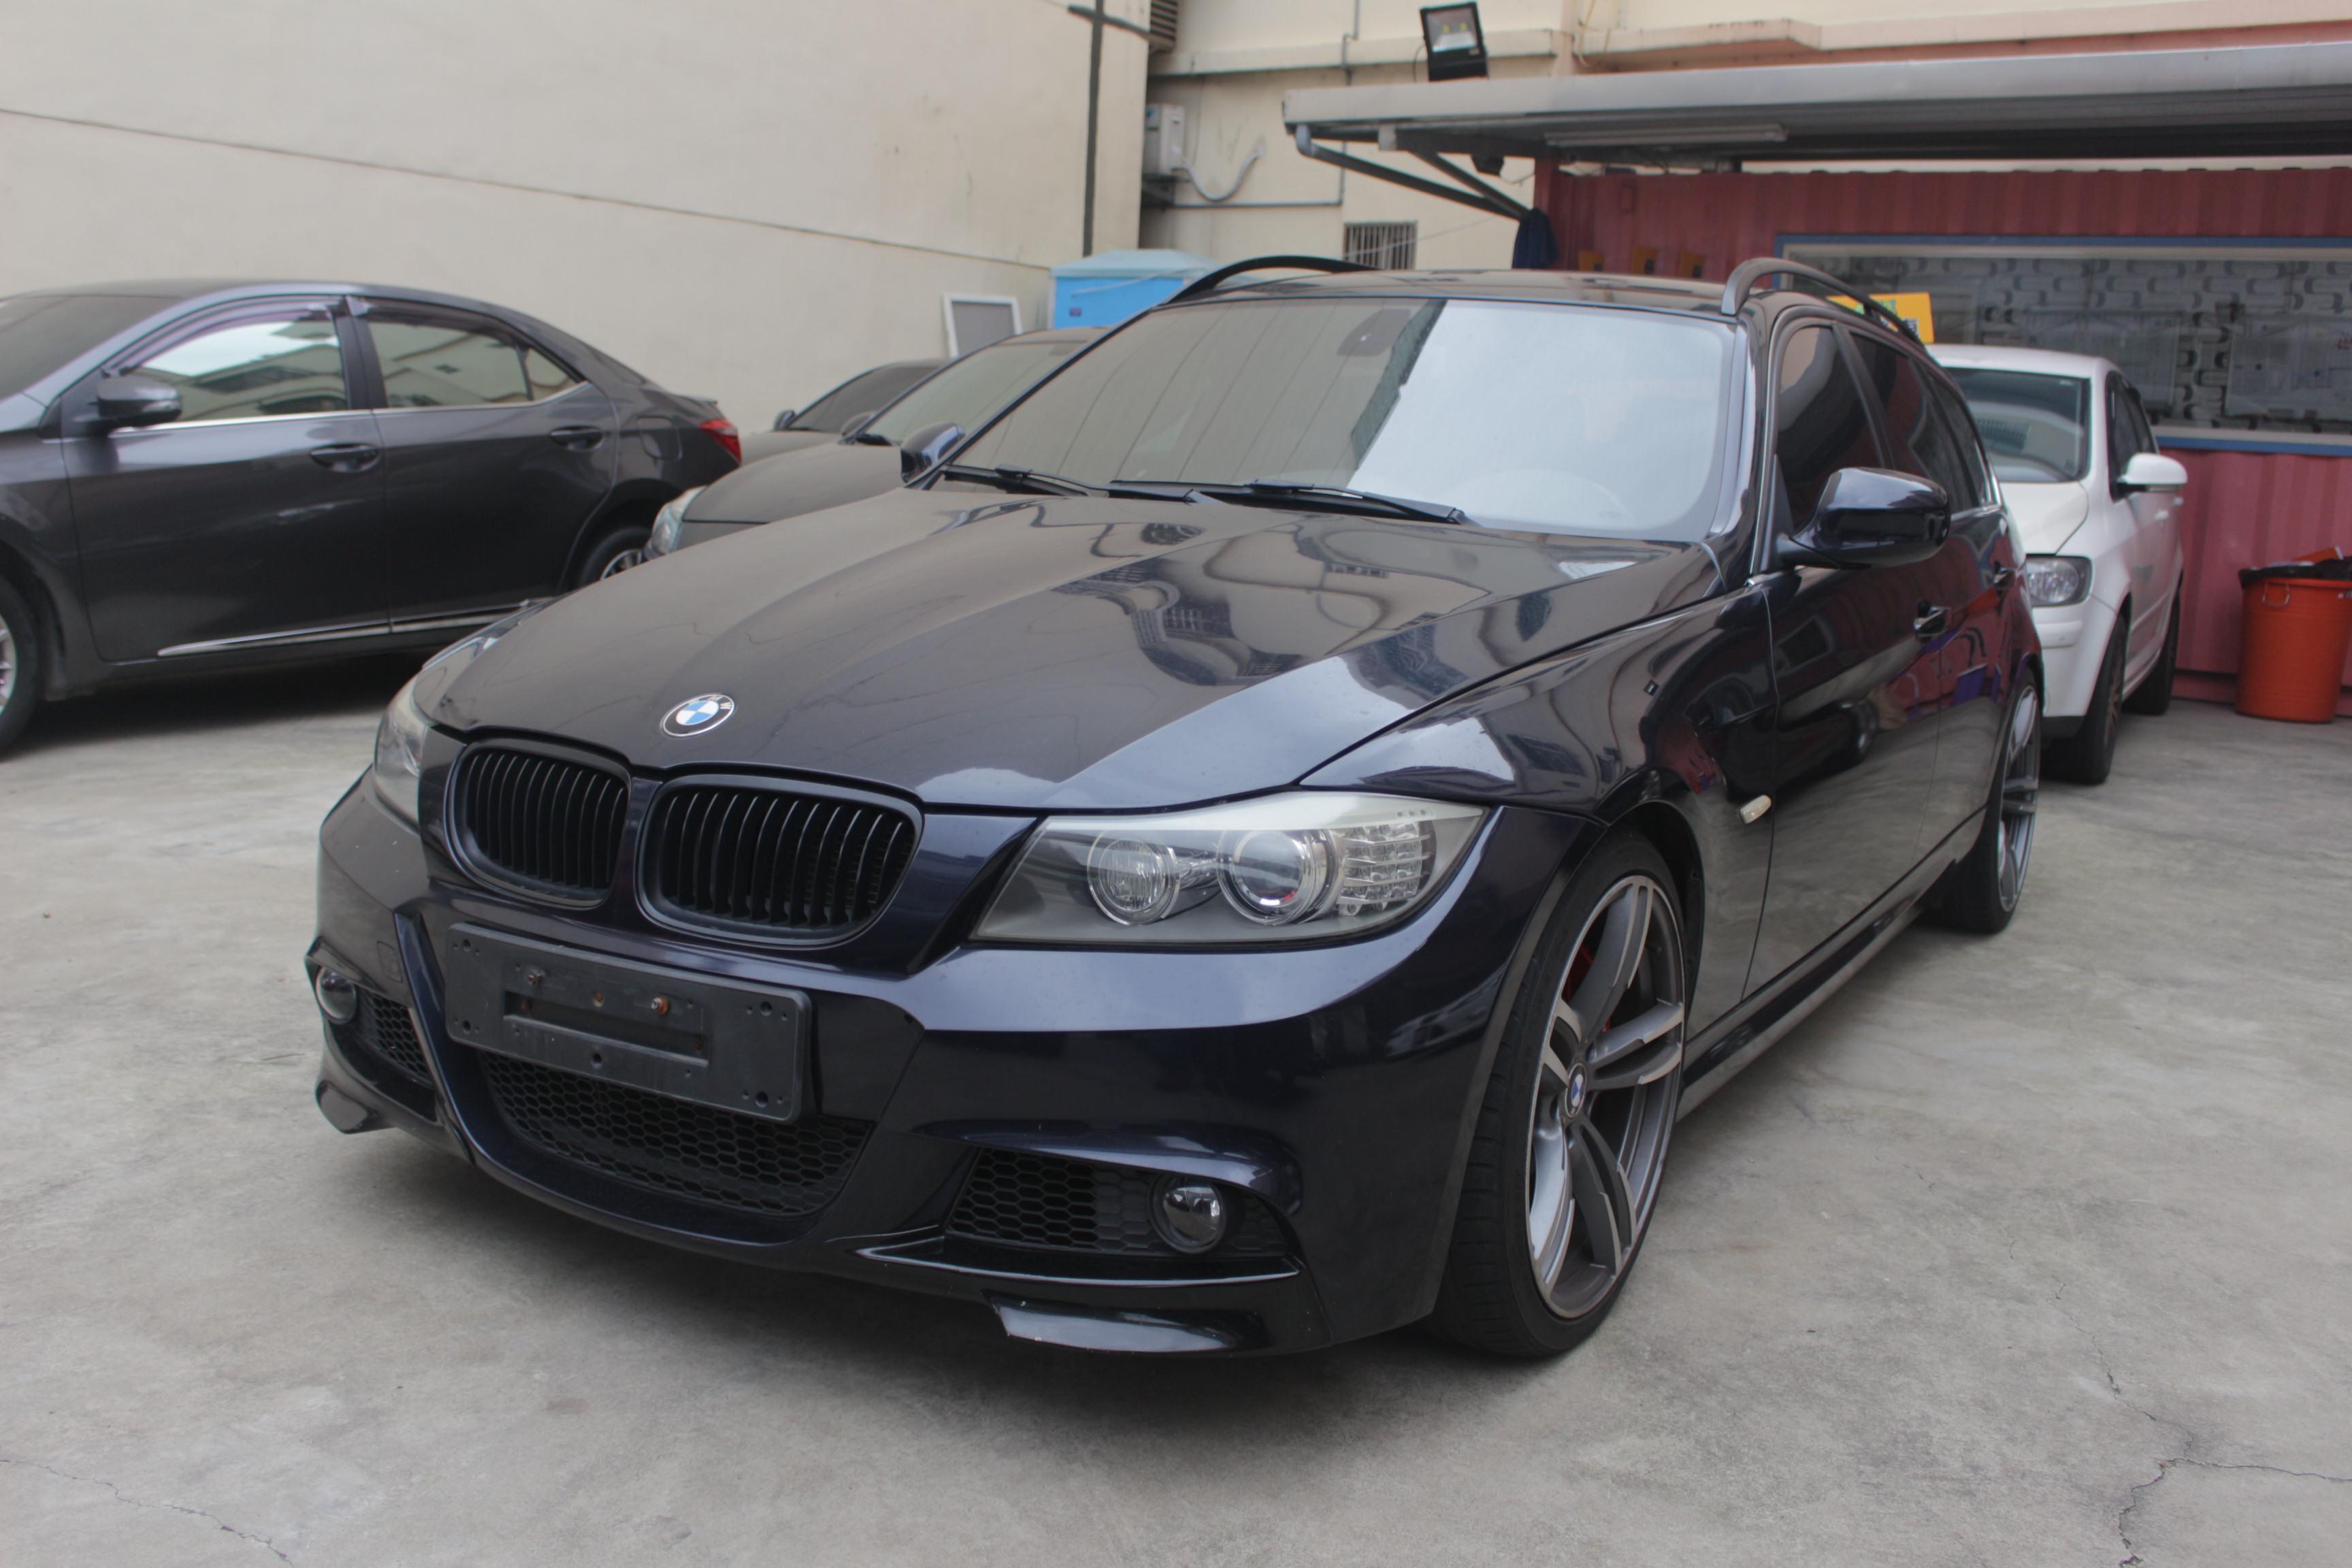 2009 BMW 寶馬 3 series touring